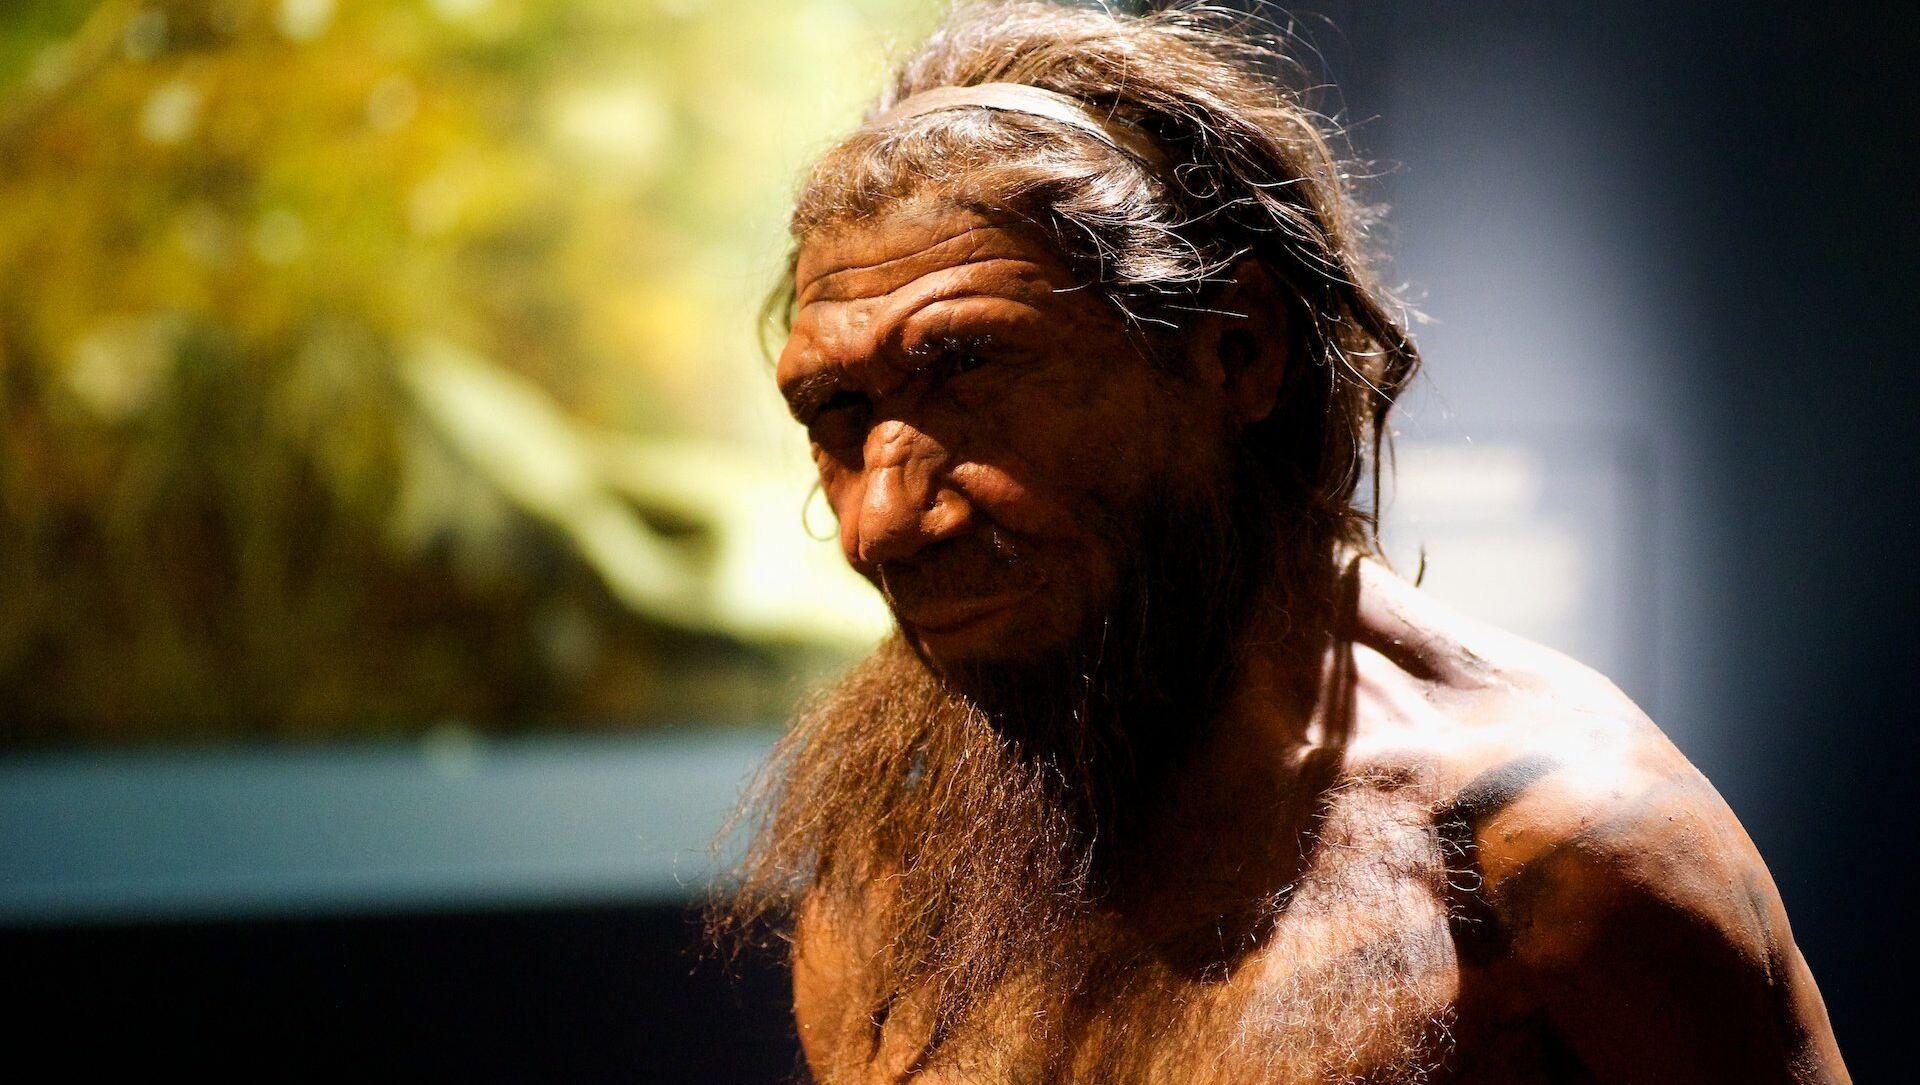 Un neandertal (imagen referencial) - Sputnik Mundo, 1920, 03.04.2020